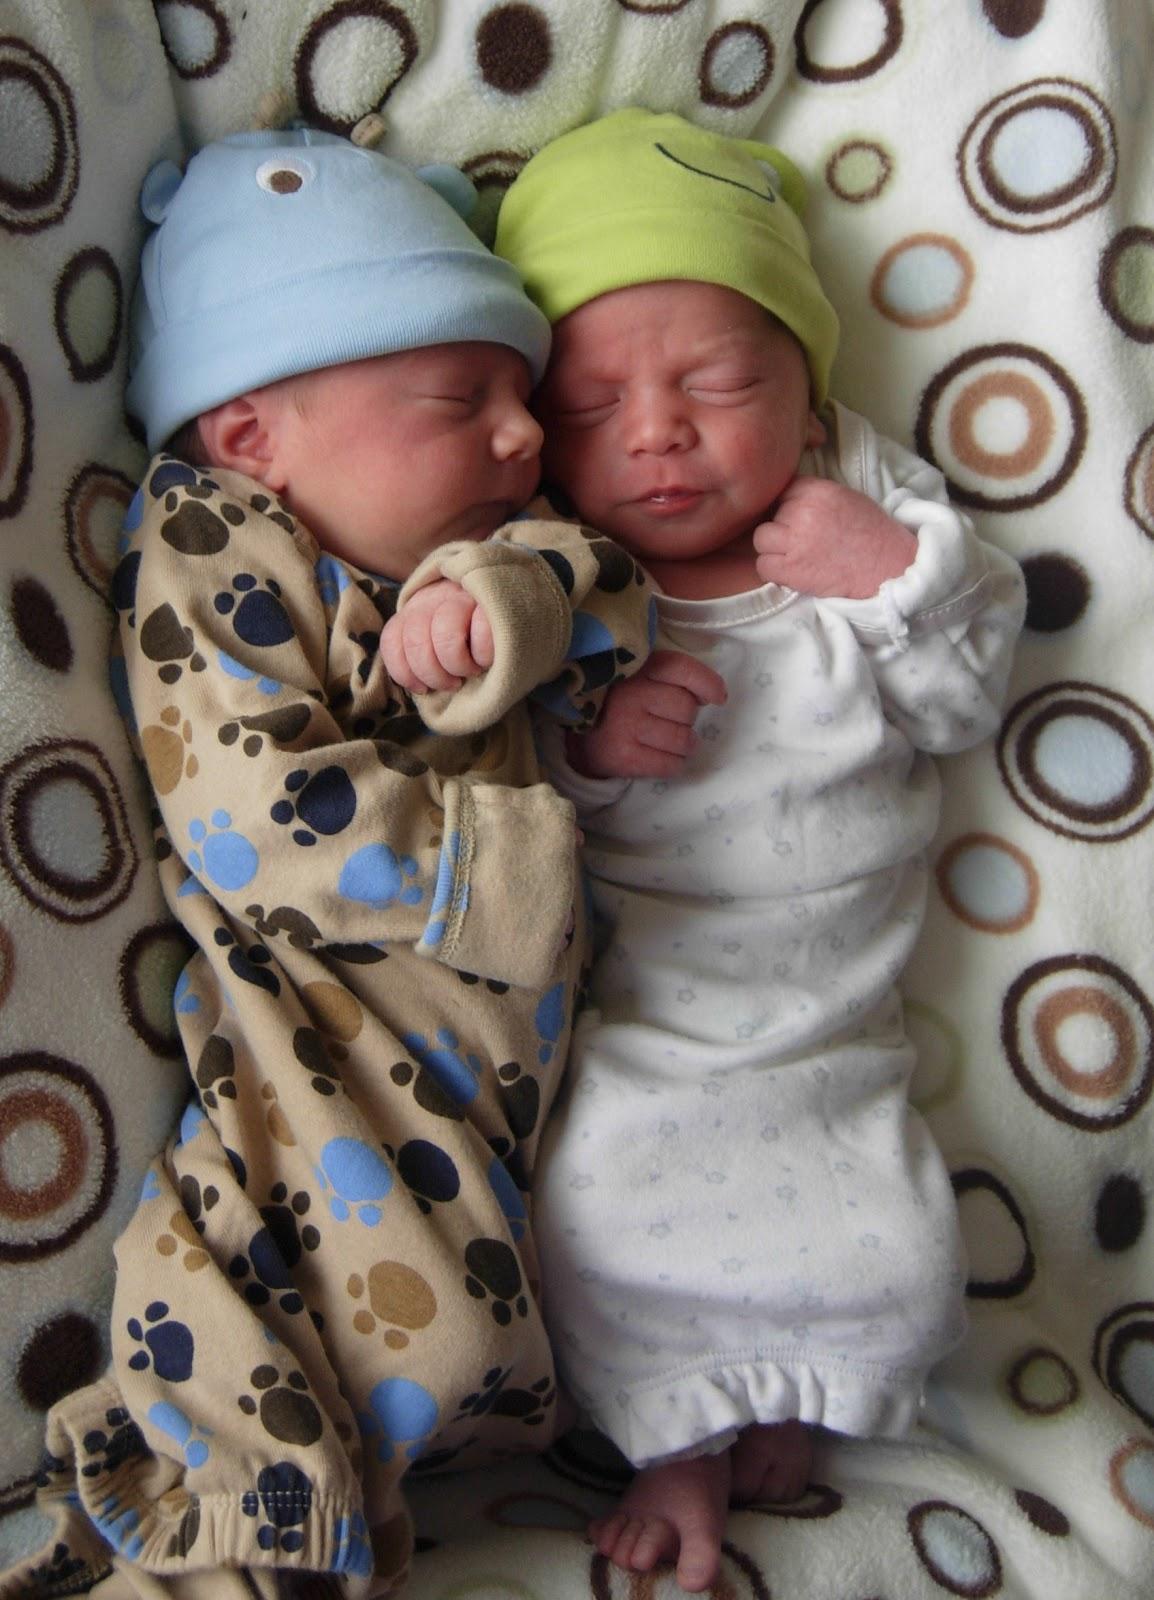 Newborn Twin Baby Boys In Hospital